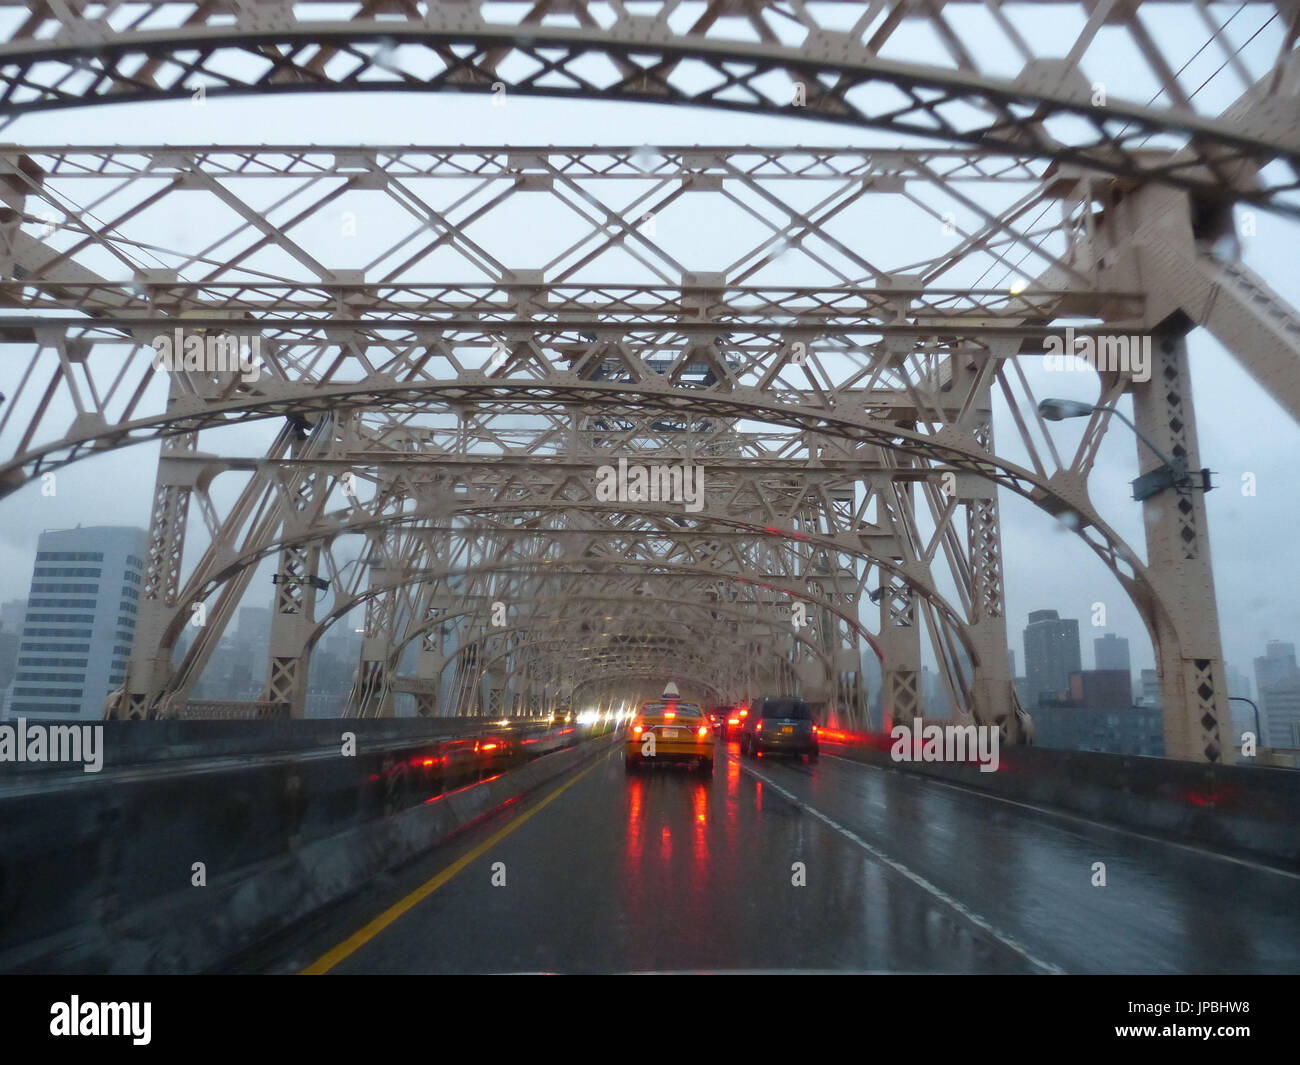 Vehicles With Brake Lights During Rain Crossing Queensborough Bridge, Aka  59th Street Bridge, Aka Ed Koch 59th Street Bridge Or Ed Koch Queensborough  Bridge